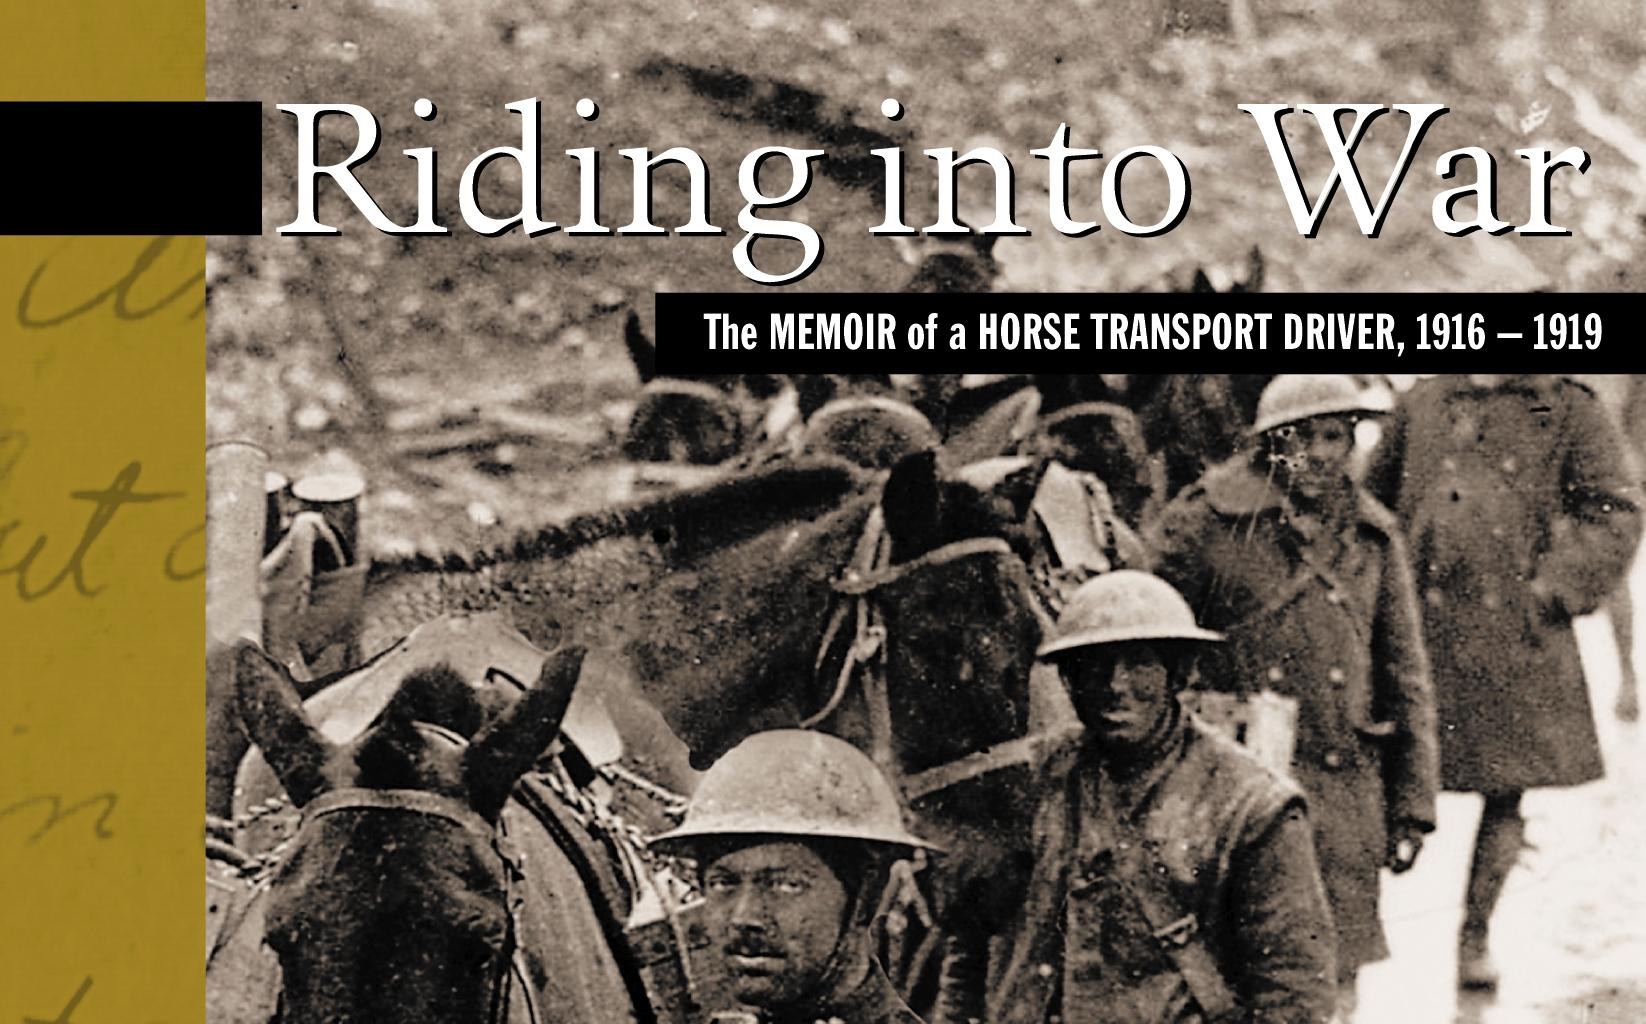 riding into war